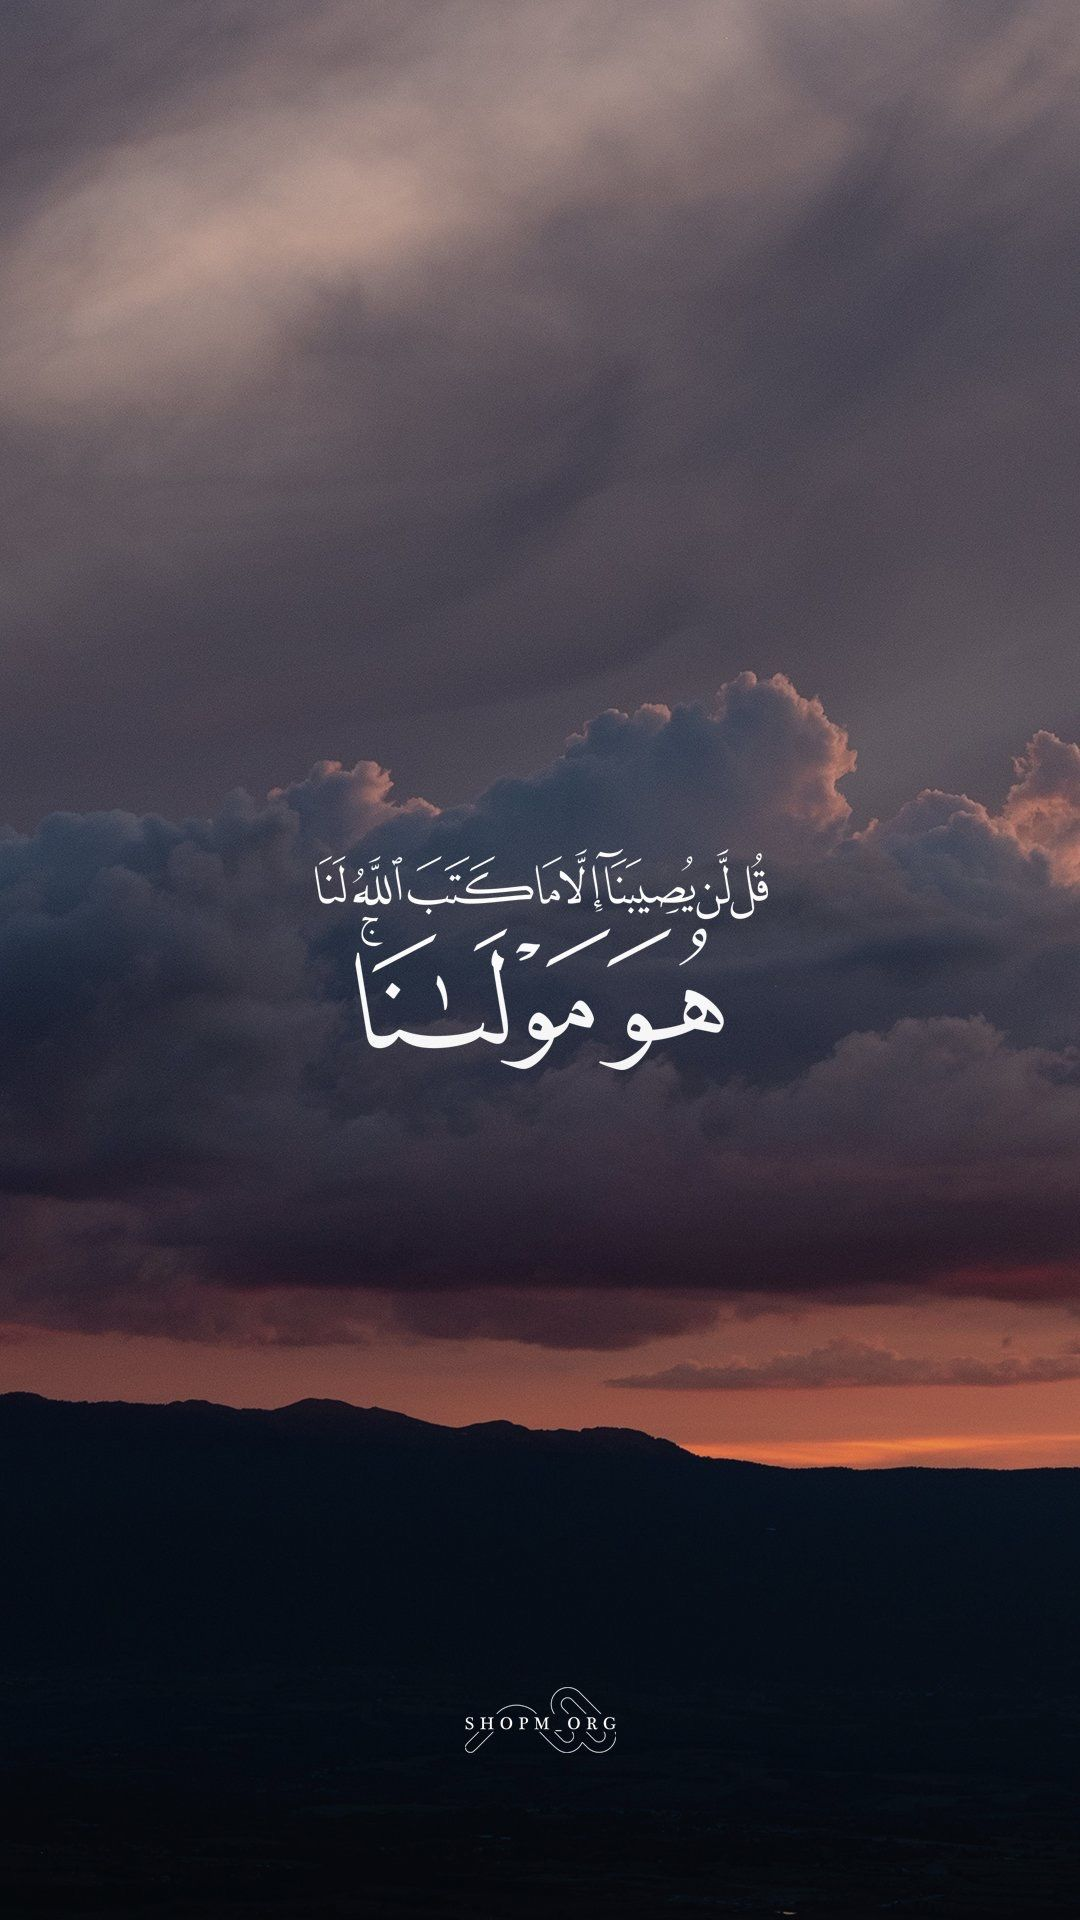 Pin By Aisyah Nadz On خلقات Islamic Quotes Quran Quotes Inspirational Quran Quotes